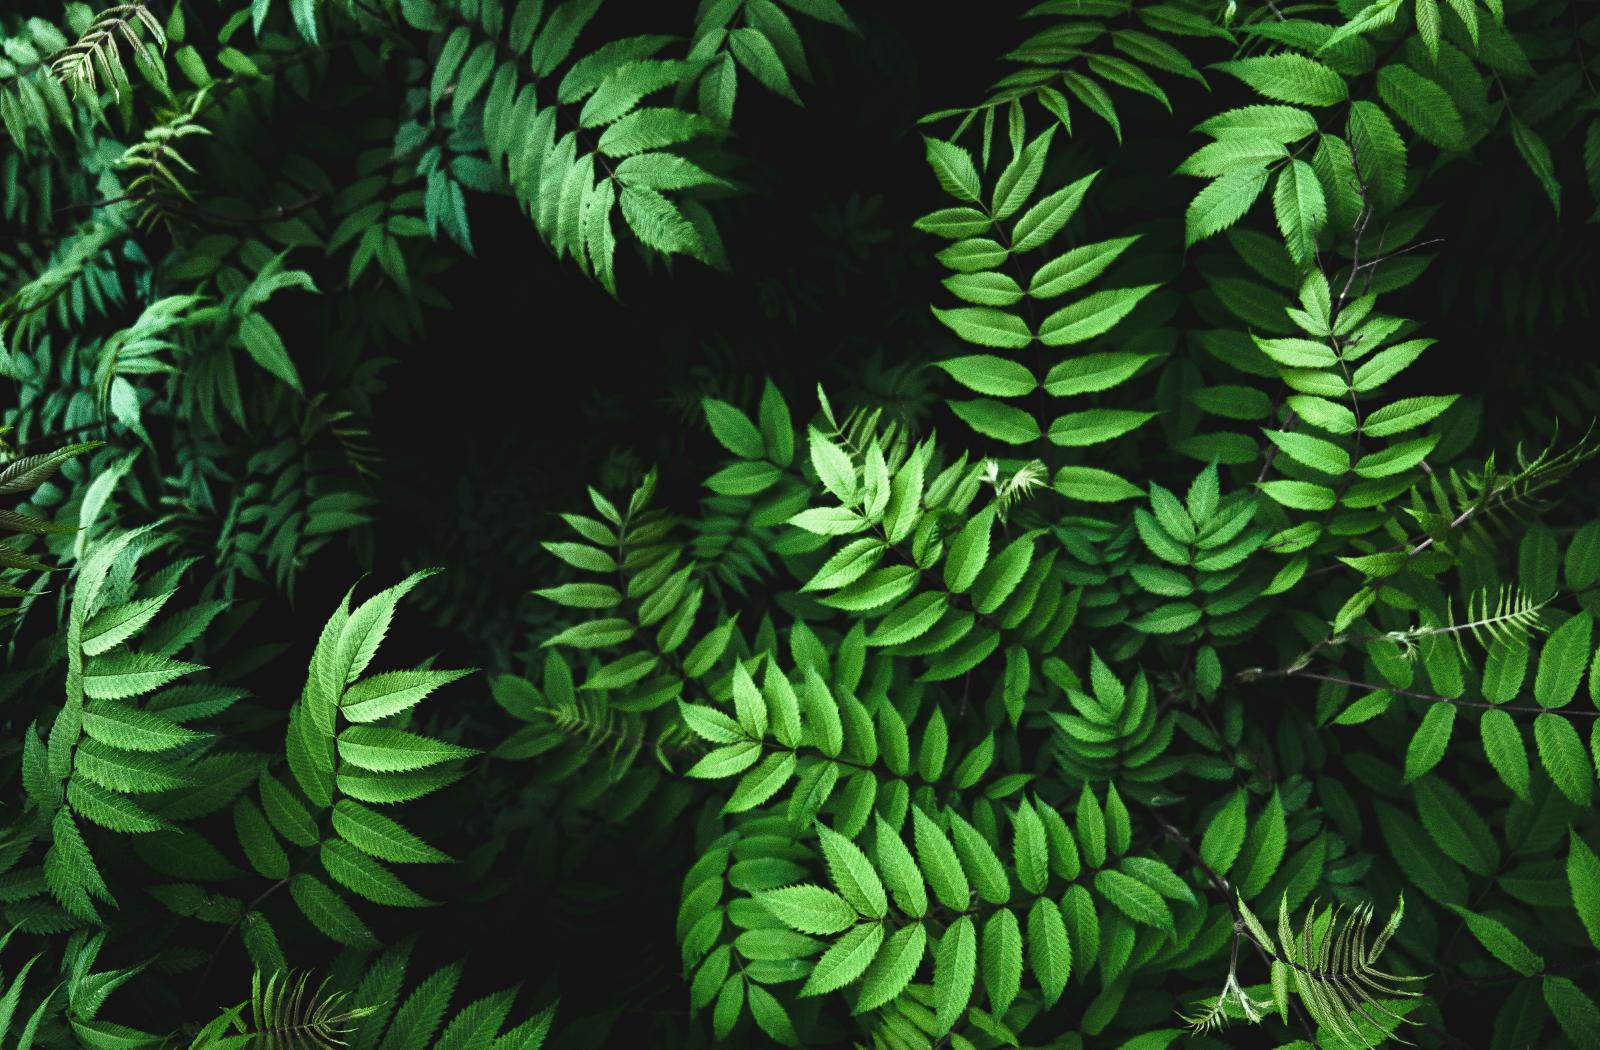 Vente de plantes arbres et v g taux ext rieurs pr s de for Vente de plantes